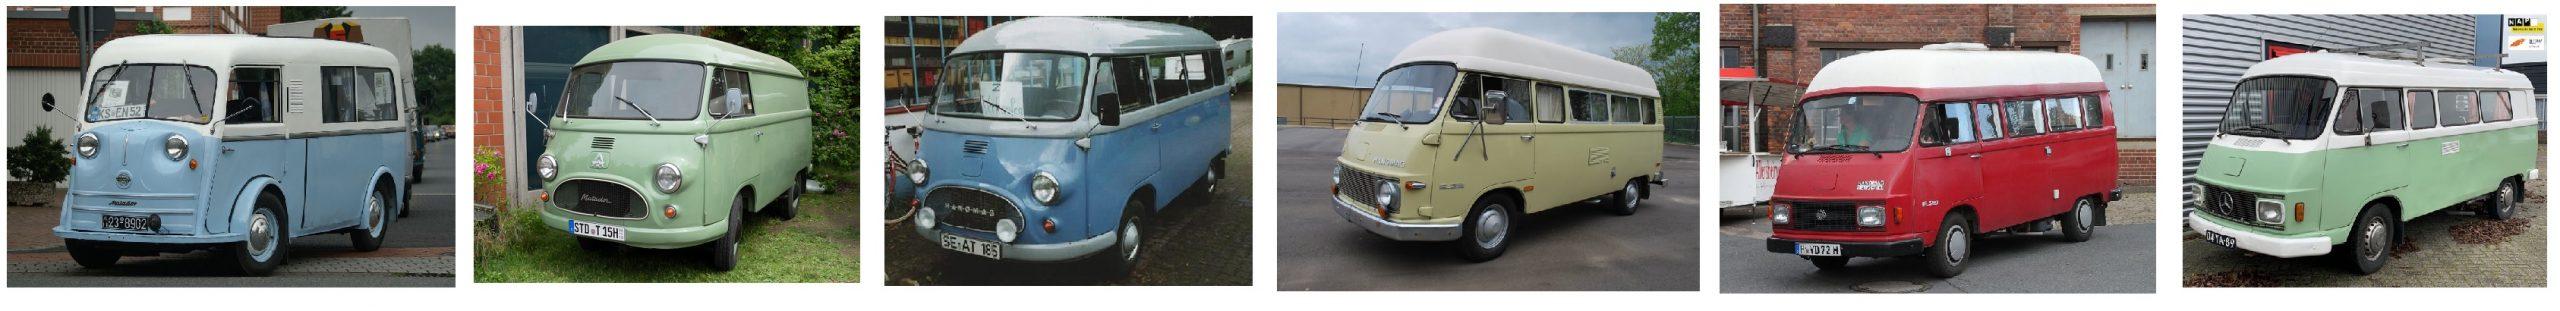 Comparativa de furgonetas Mercedes Antiguas tipo Harburger Hanomag